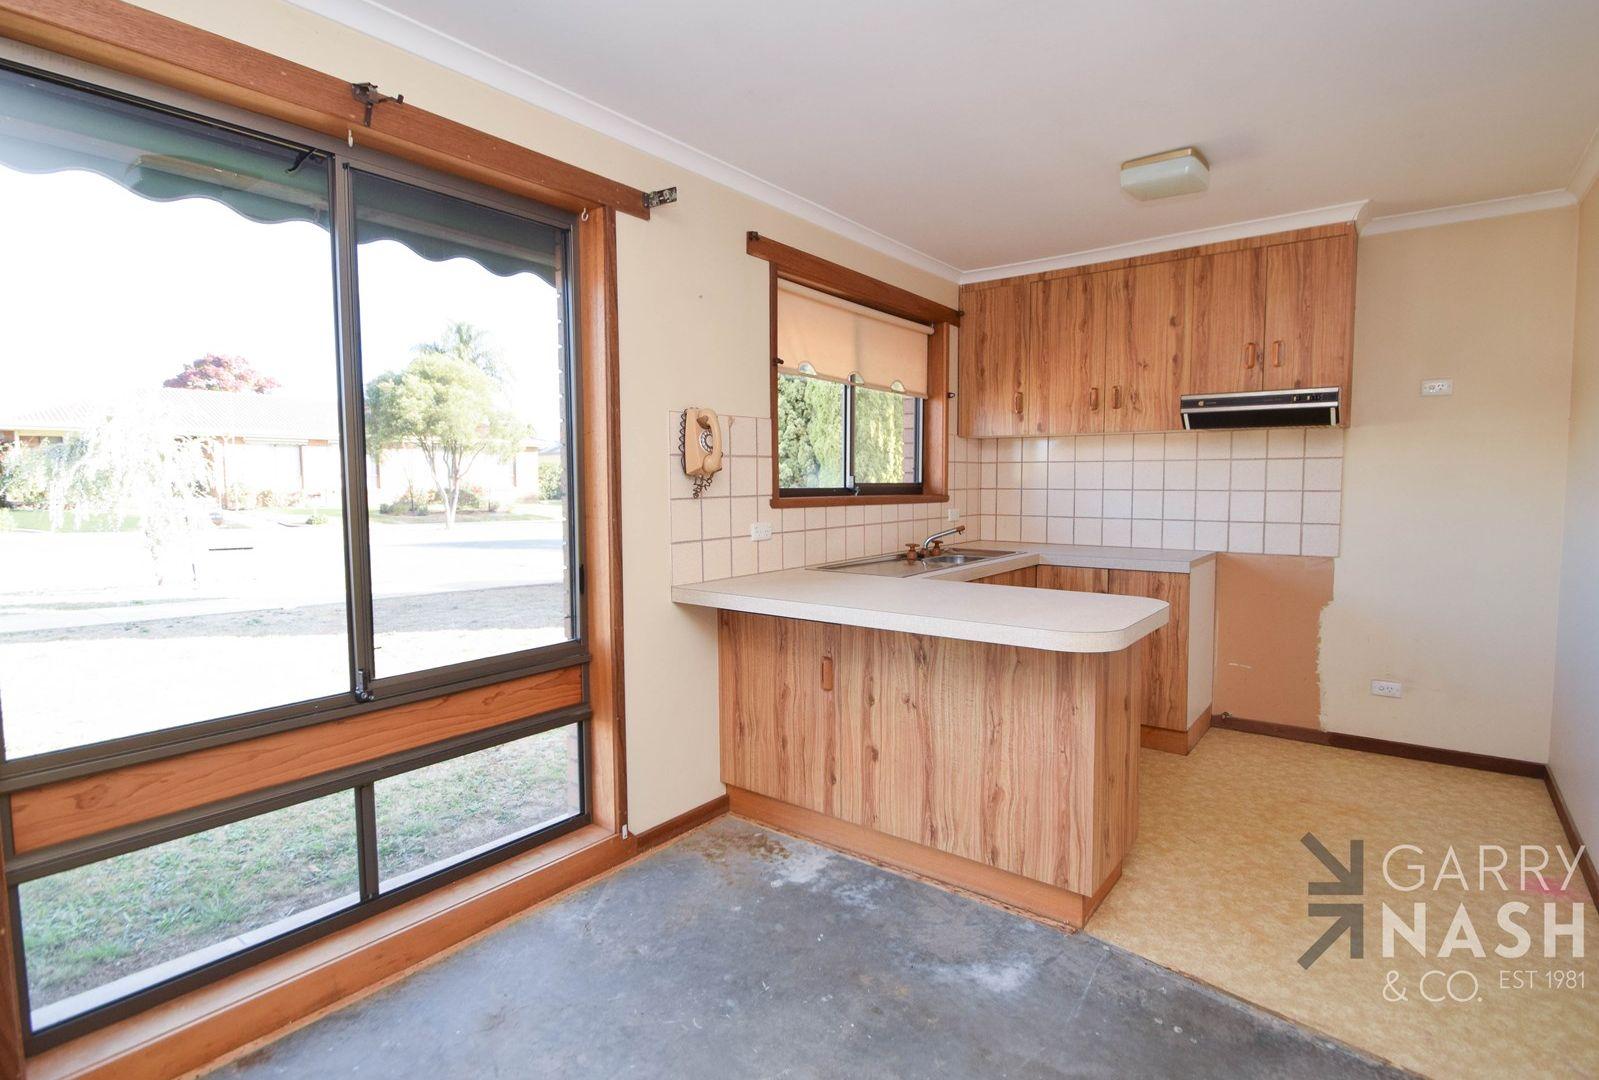 1/11 Hulme Drive, Wangaratta VIC 3677, Image 2